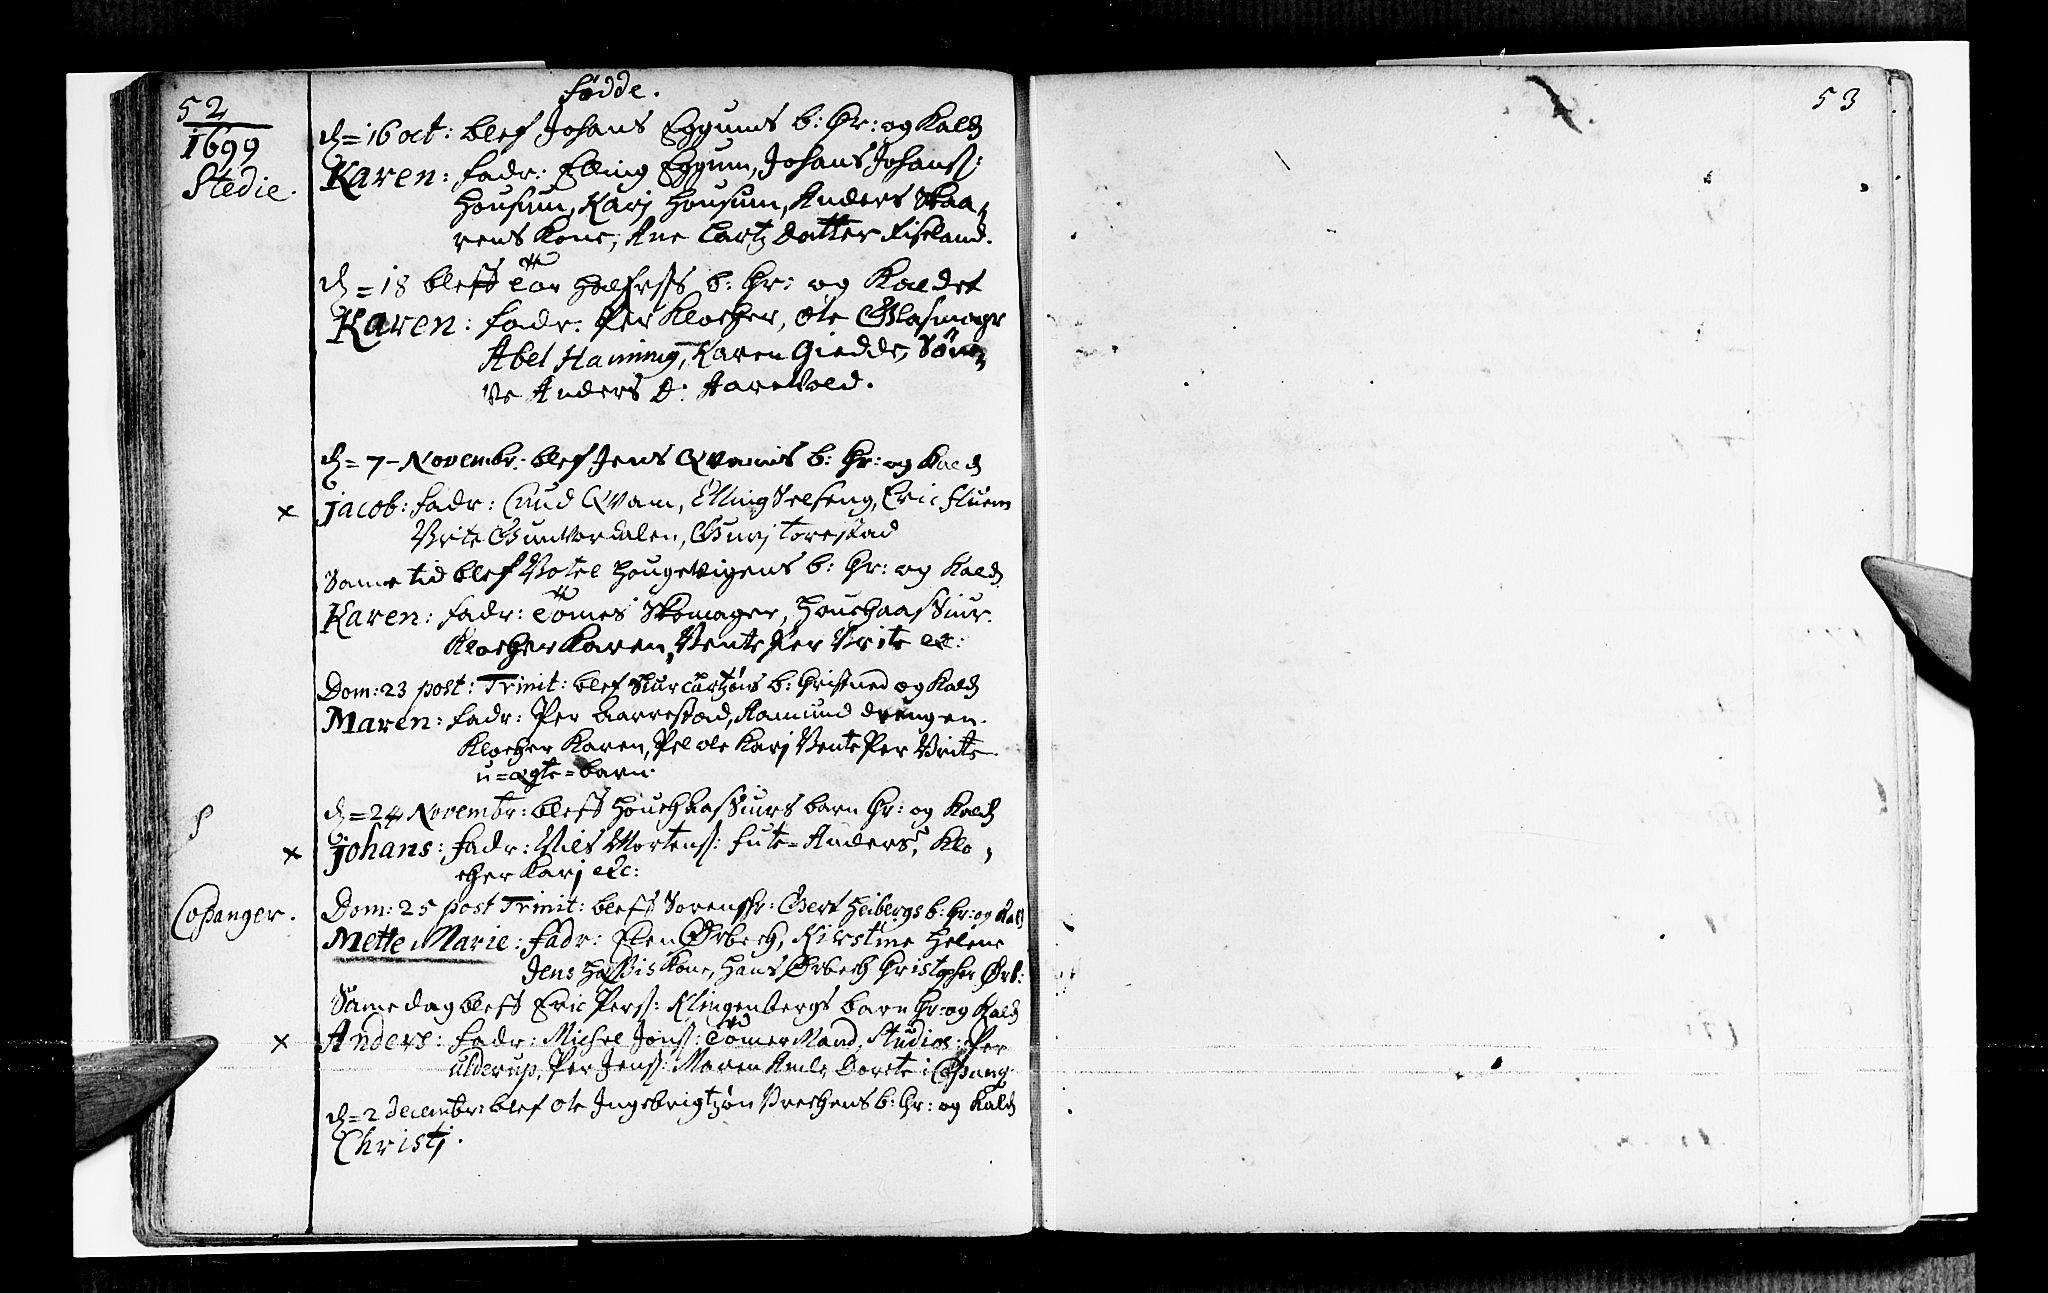 SAB, Sogndal sokneprestembete, H/Haa/Haaa/L0001: Ministerialbok nr. A 1, 1689-1713, s. 52-53